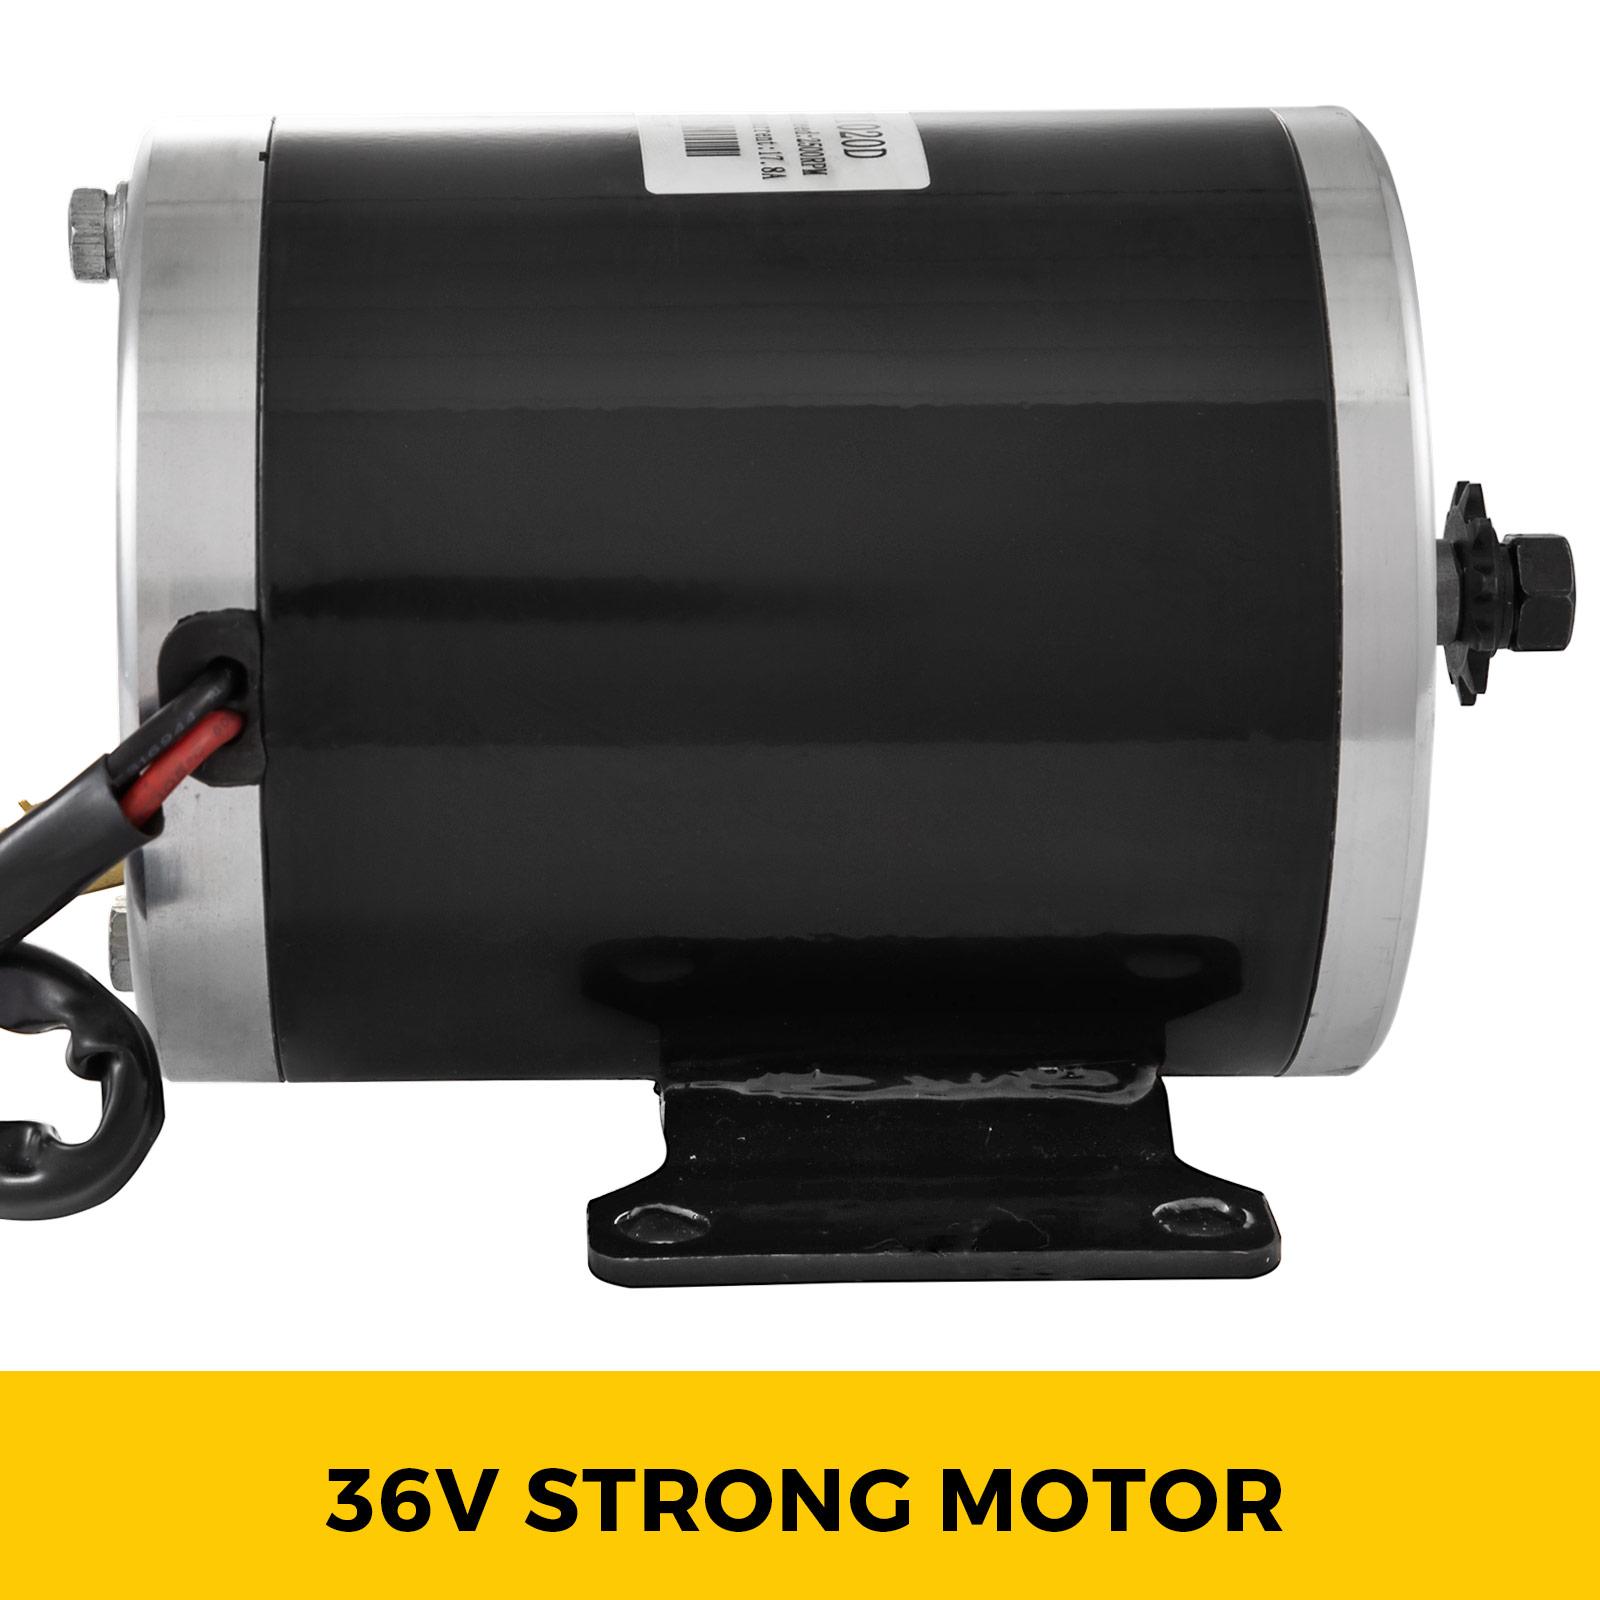 36v-Electric-Motor-controller-throttle-kit-f-Scooter-E-Scooter-ATV-Permanent thumbnail 26